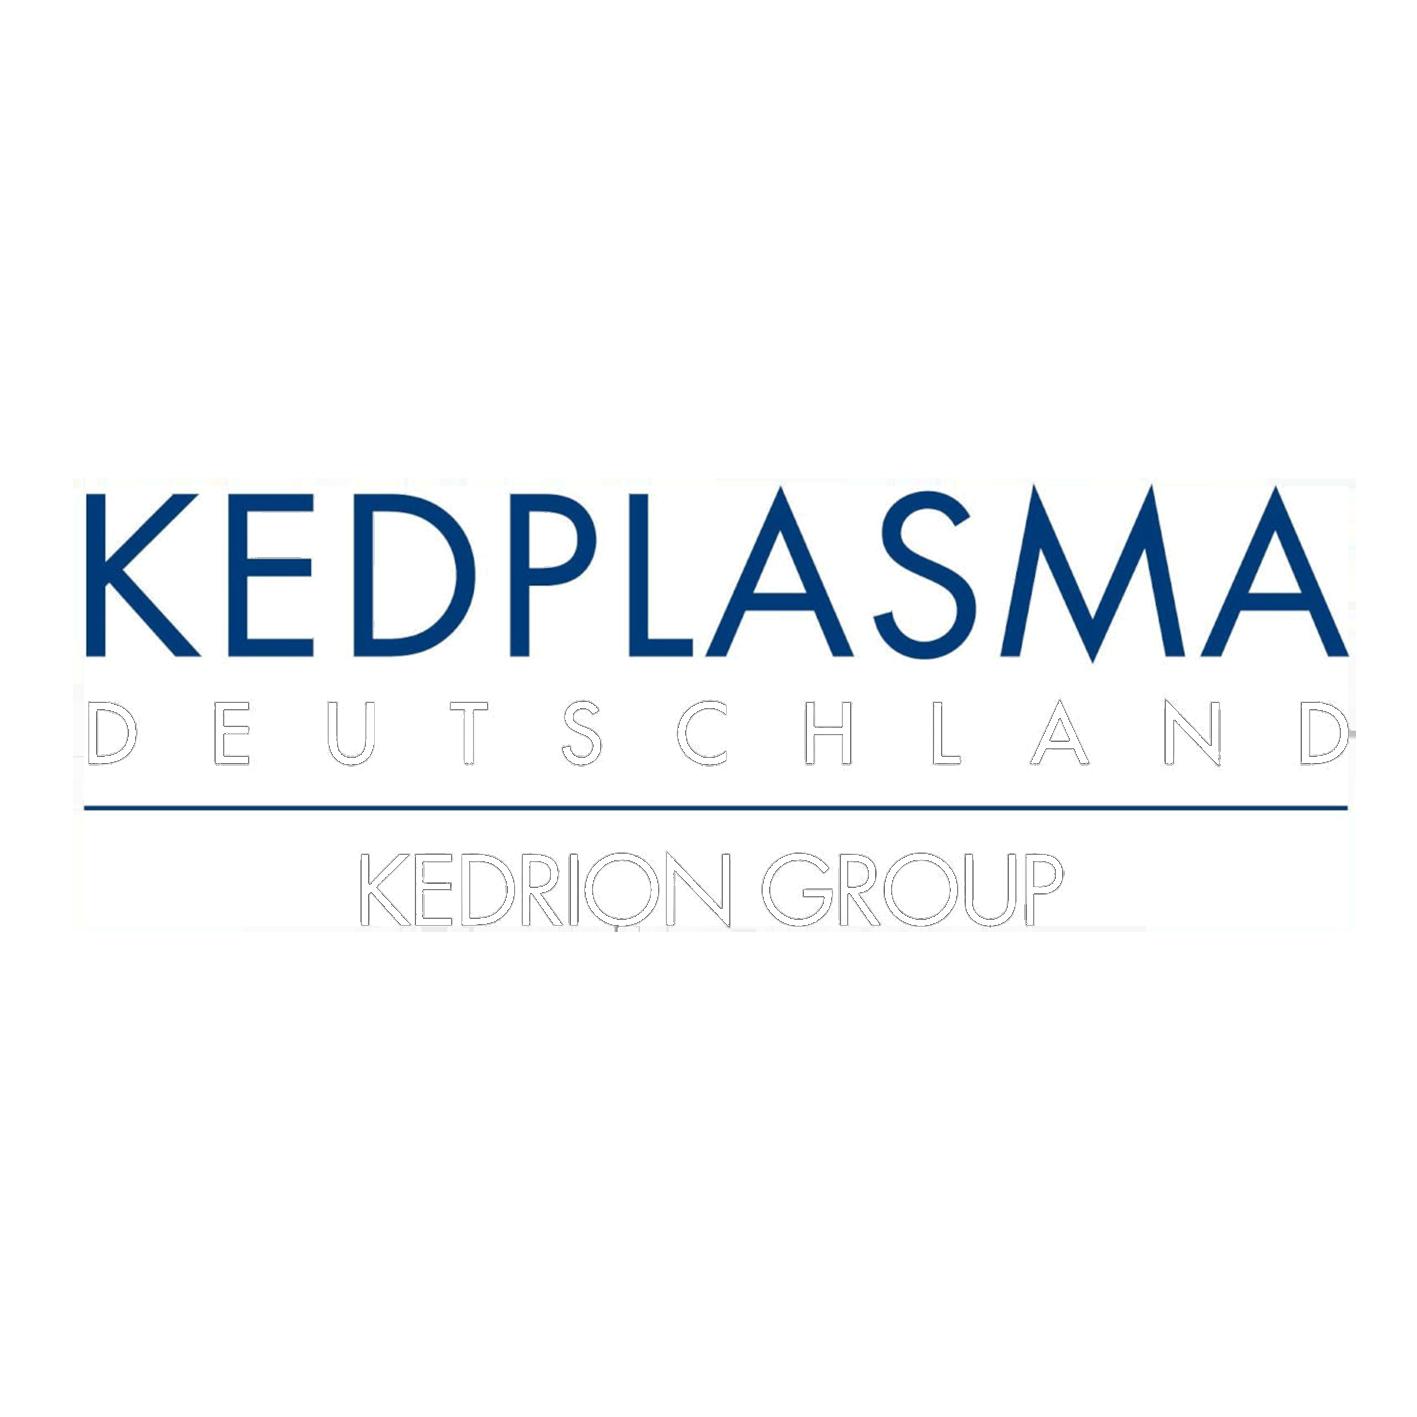 kedplasma-logo